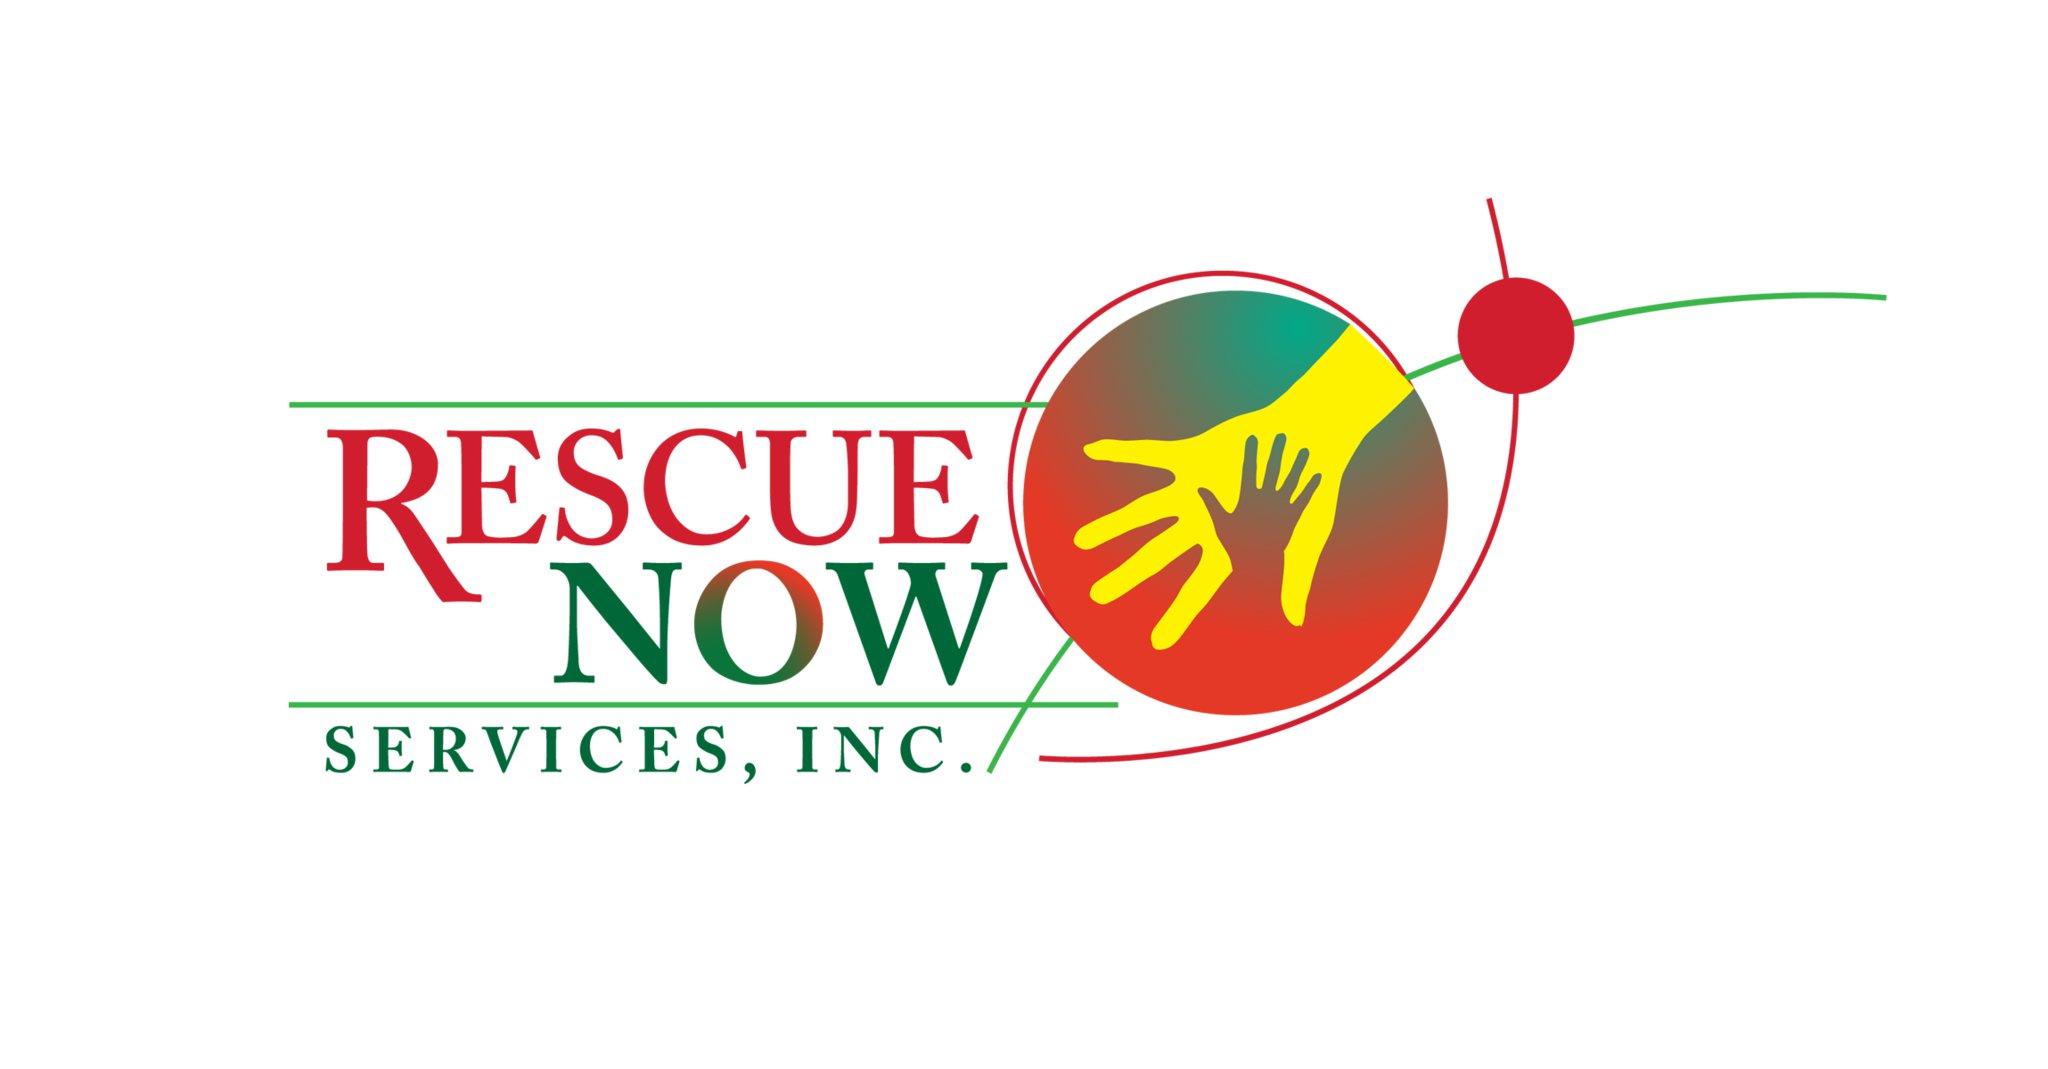 Rescue Now Services